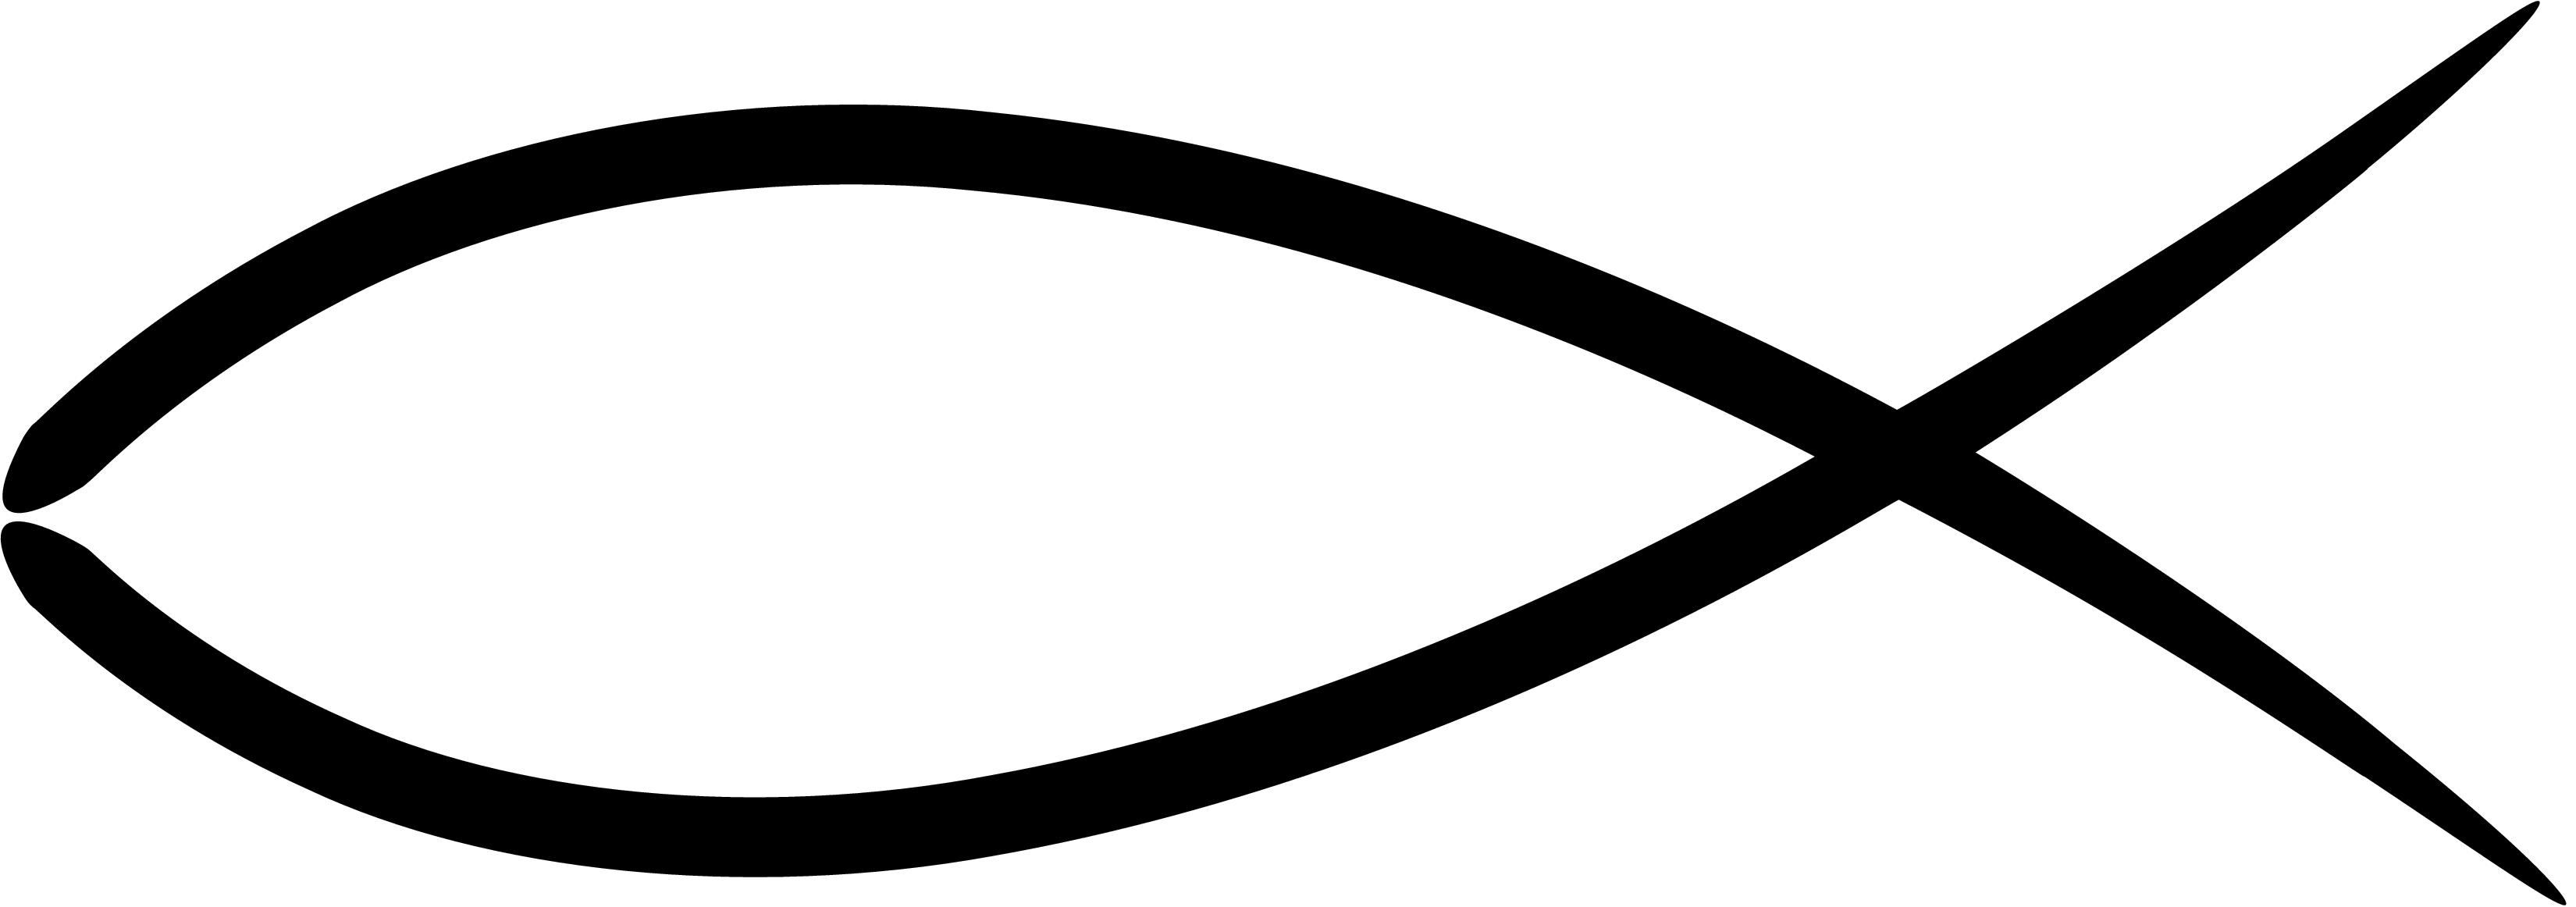 Christian God Symbol